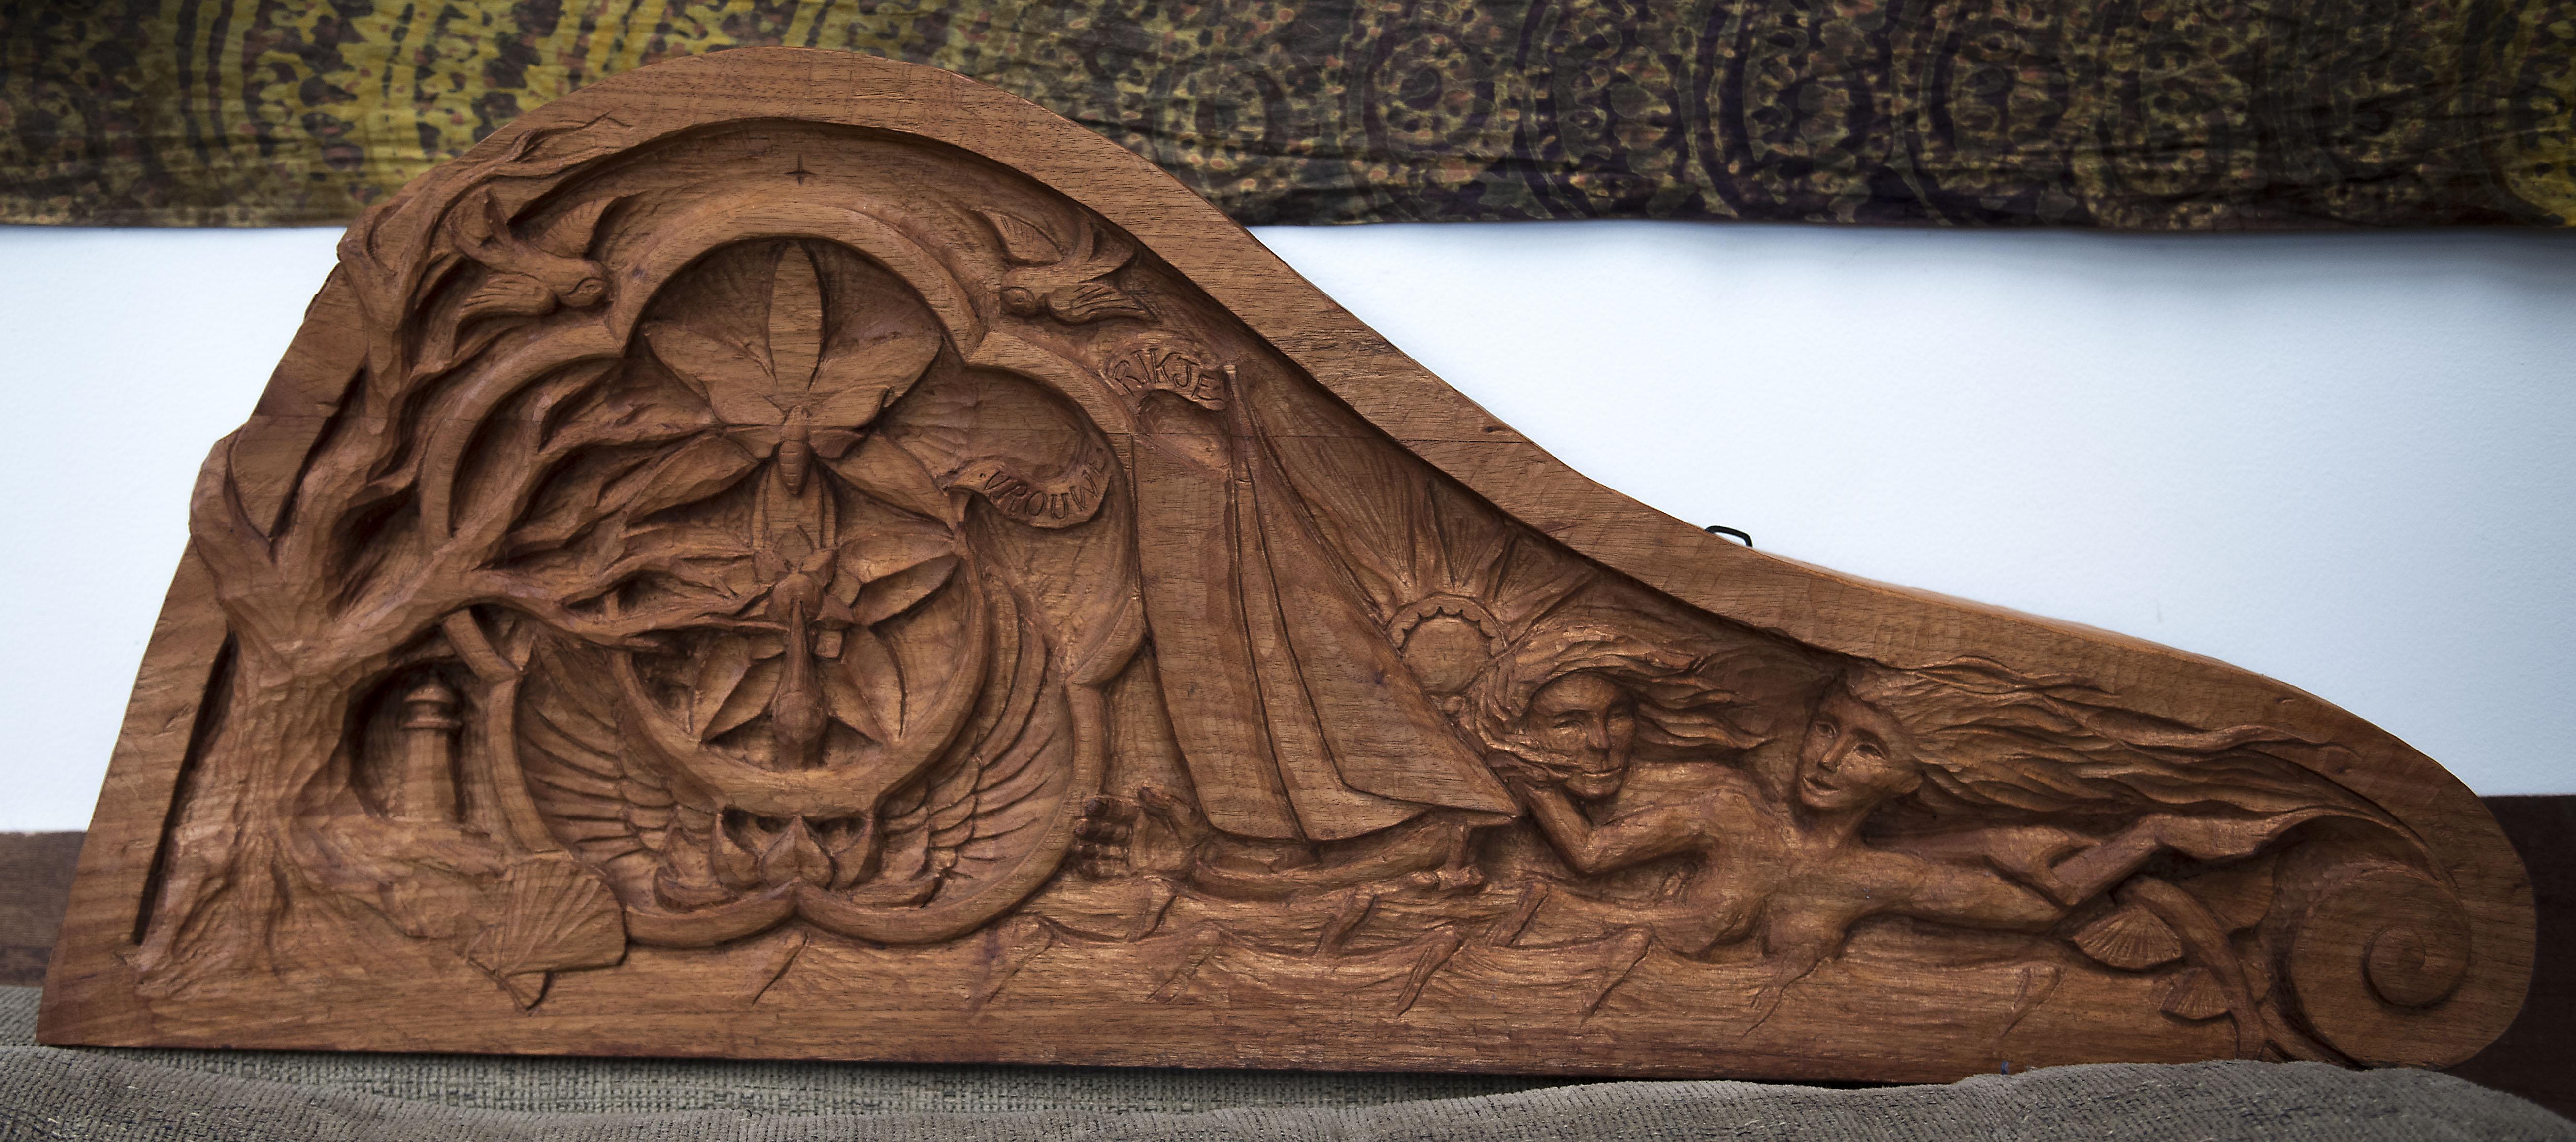 Lynx carving4